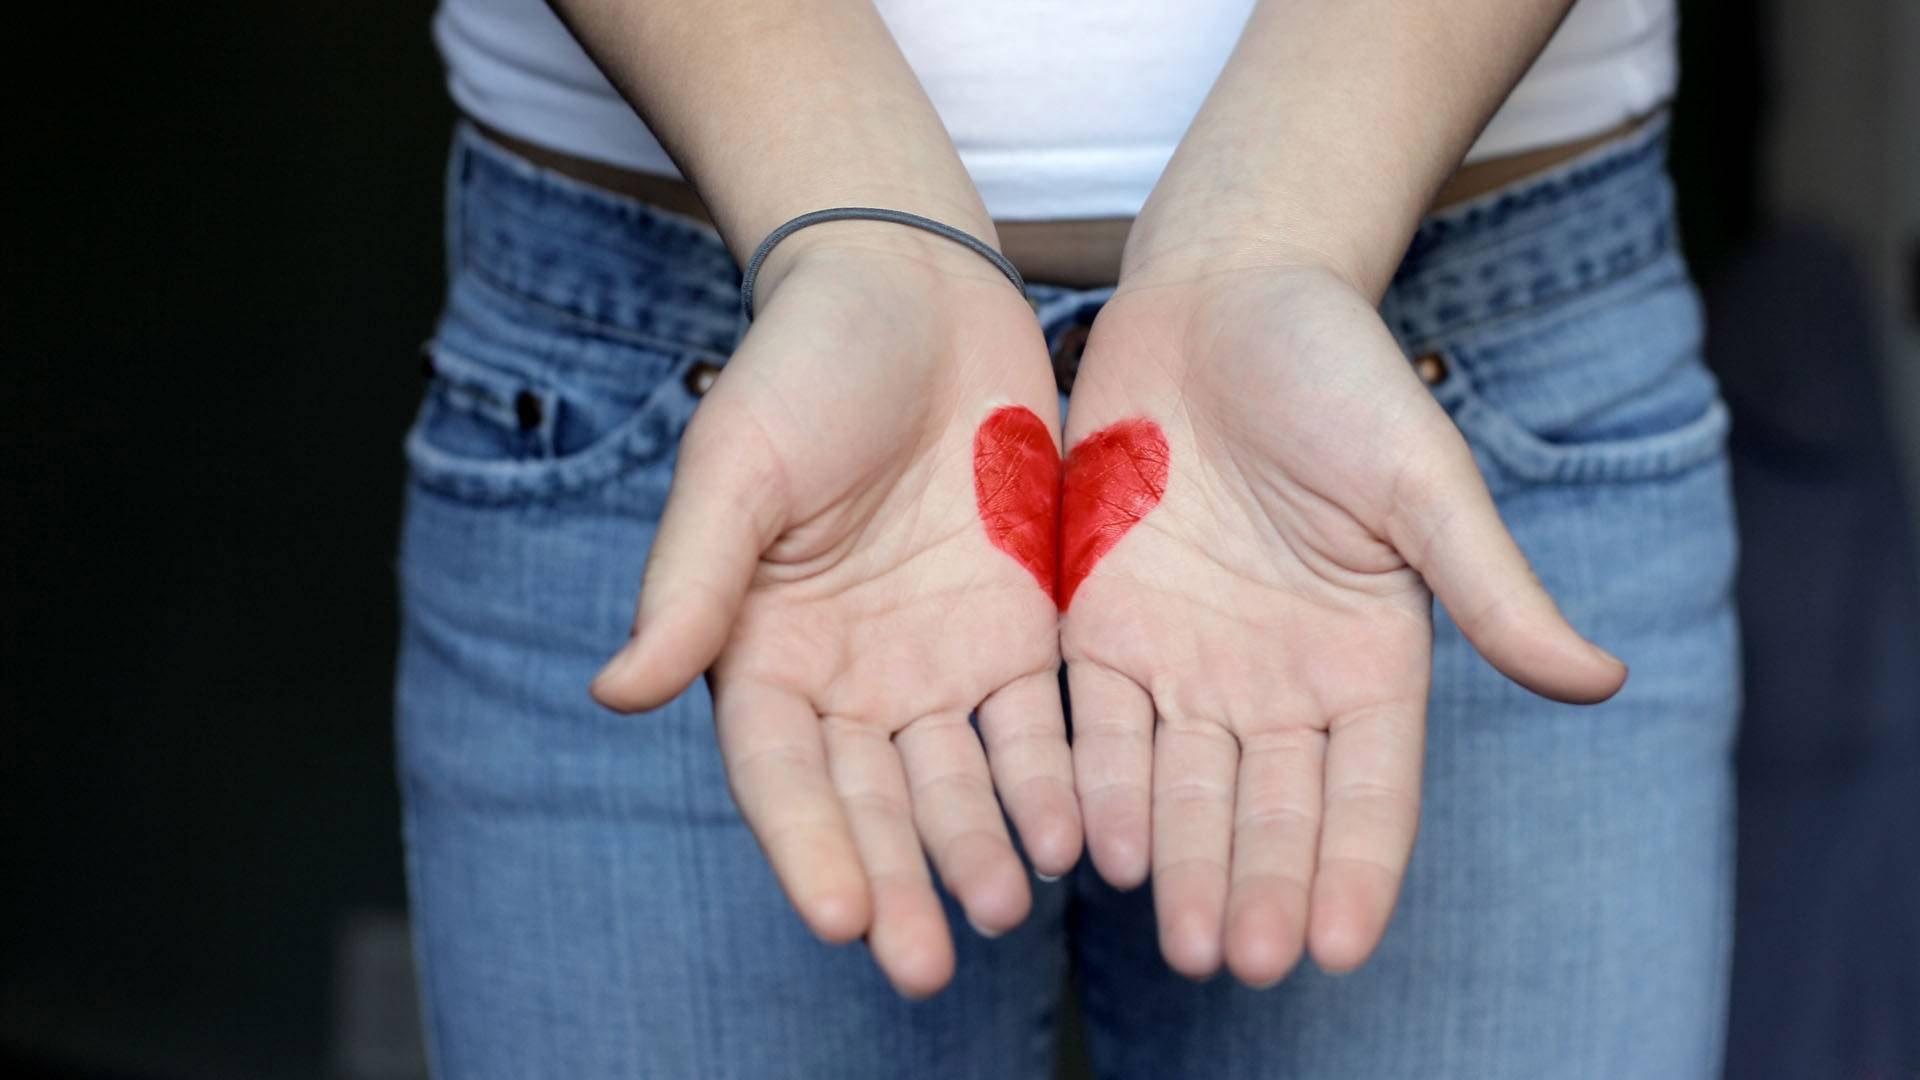 Фото девушки делающая сердечко